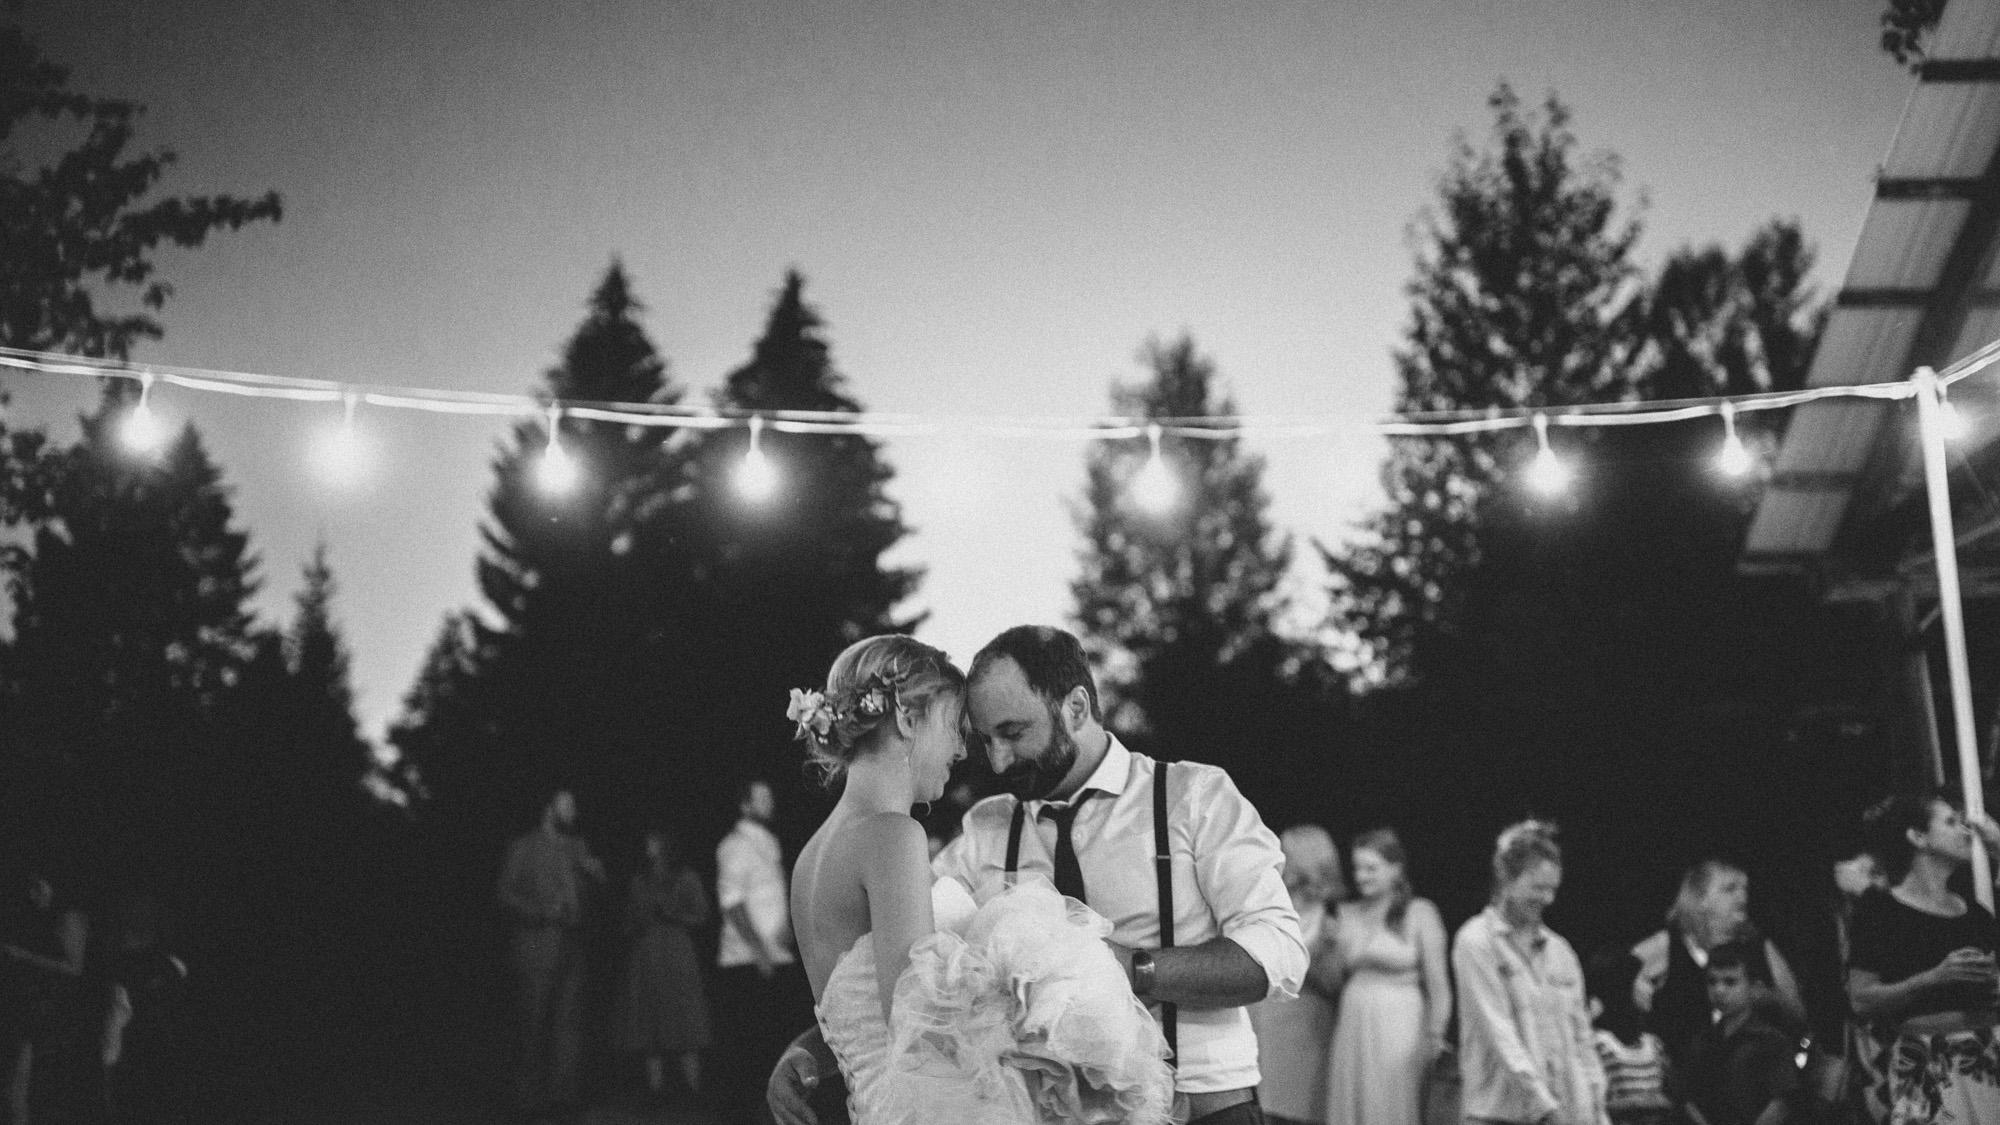 Montana_Wedding_Photos_alec_vanderboom-0143.jpg